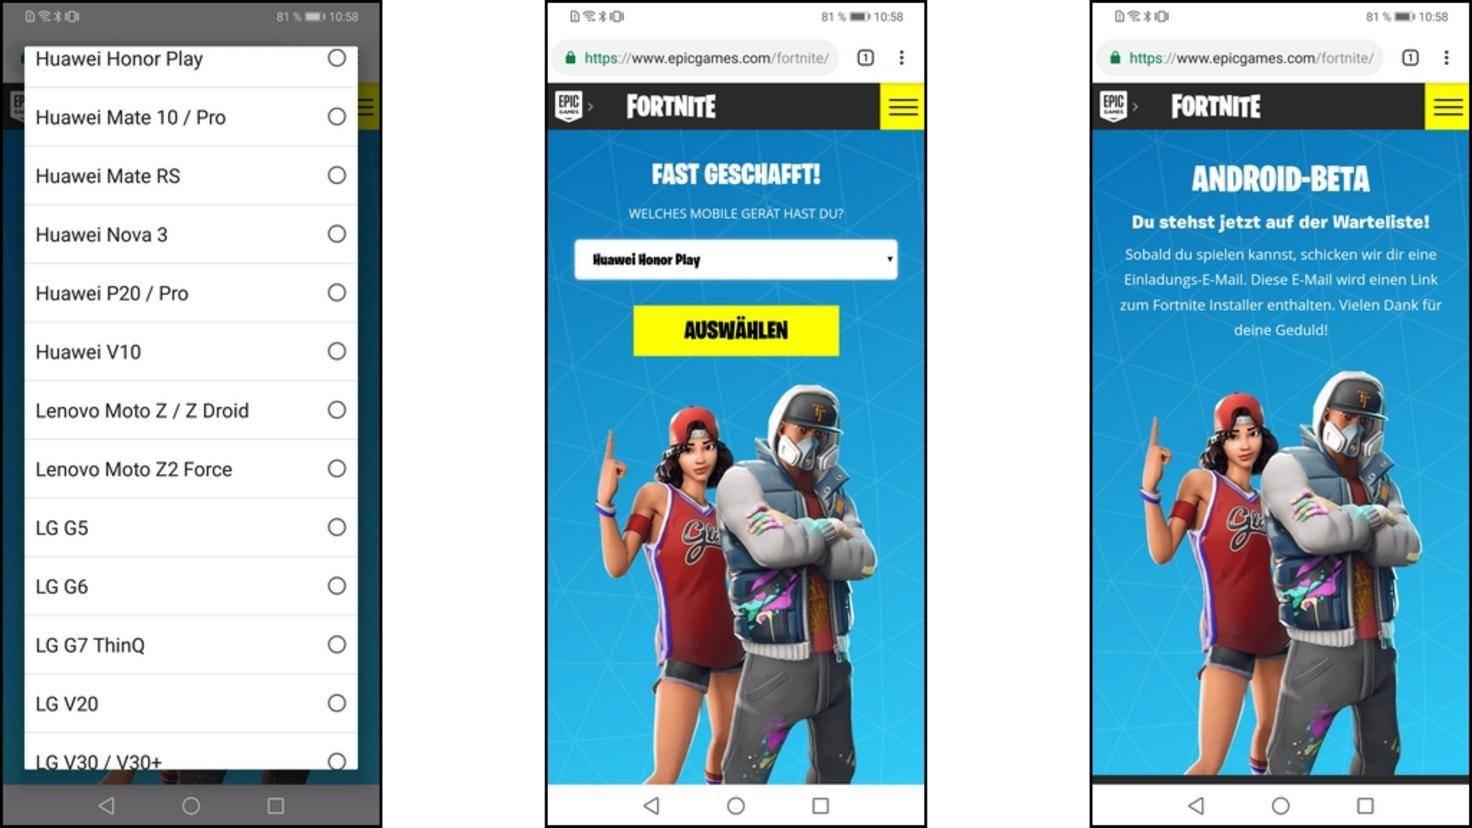 Fortnite-Android-Registrierung